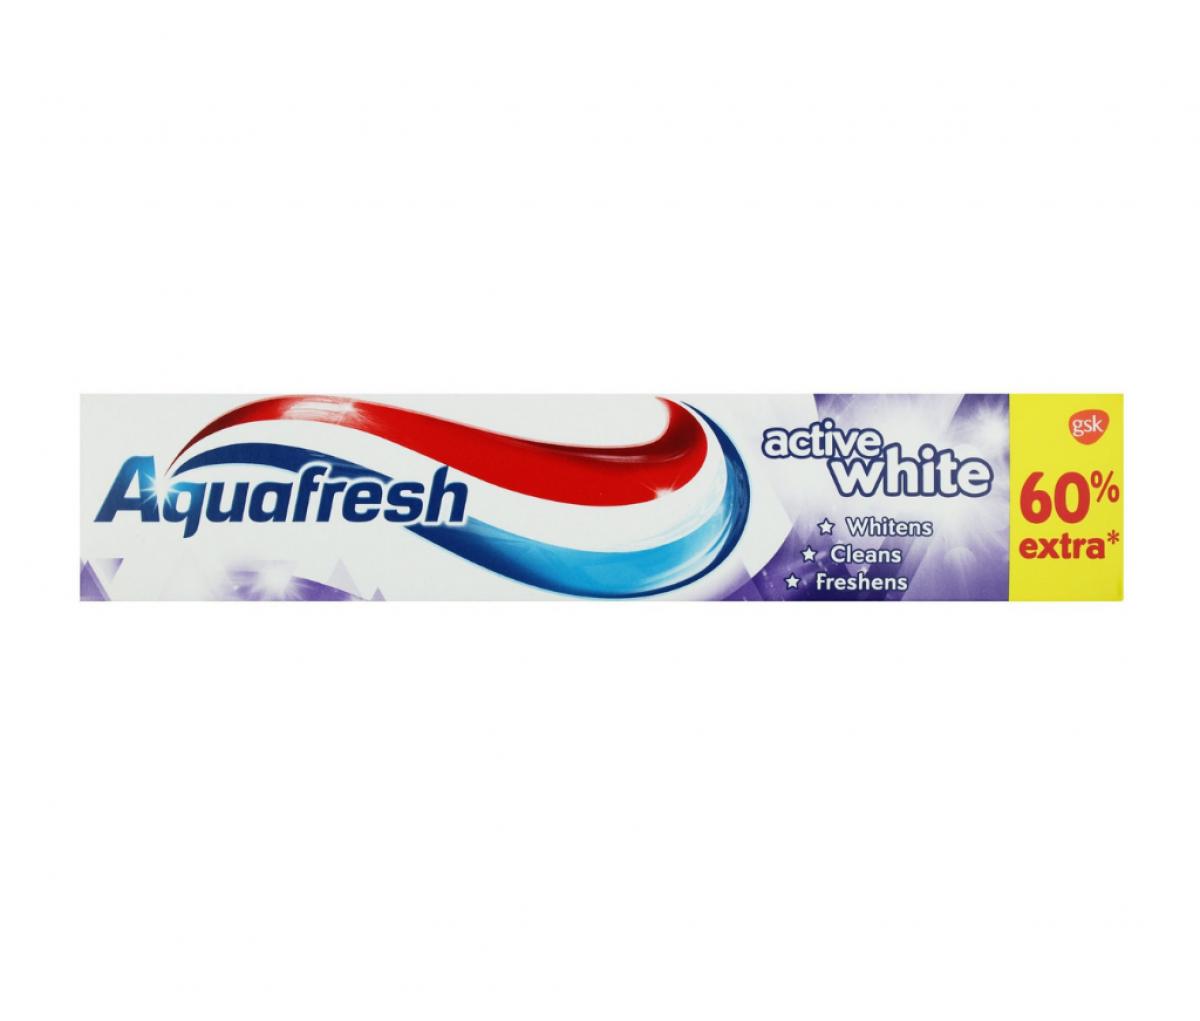 Aquafresh 125ml Active White Toothpaste